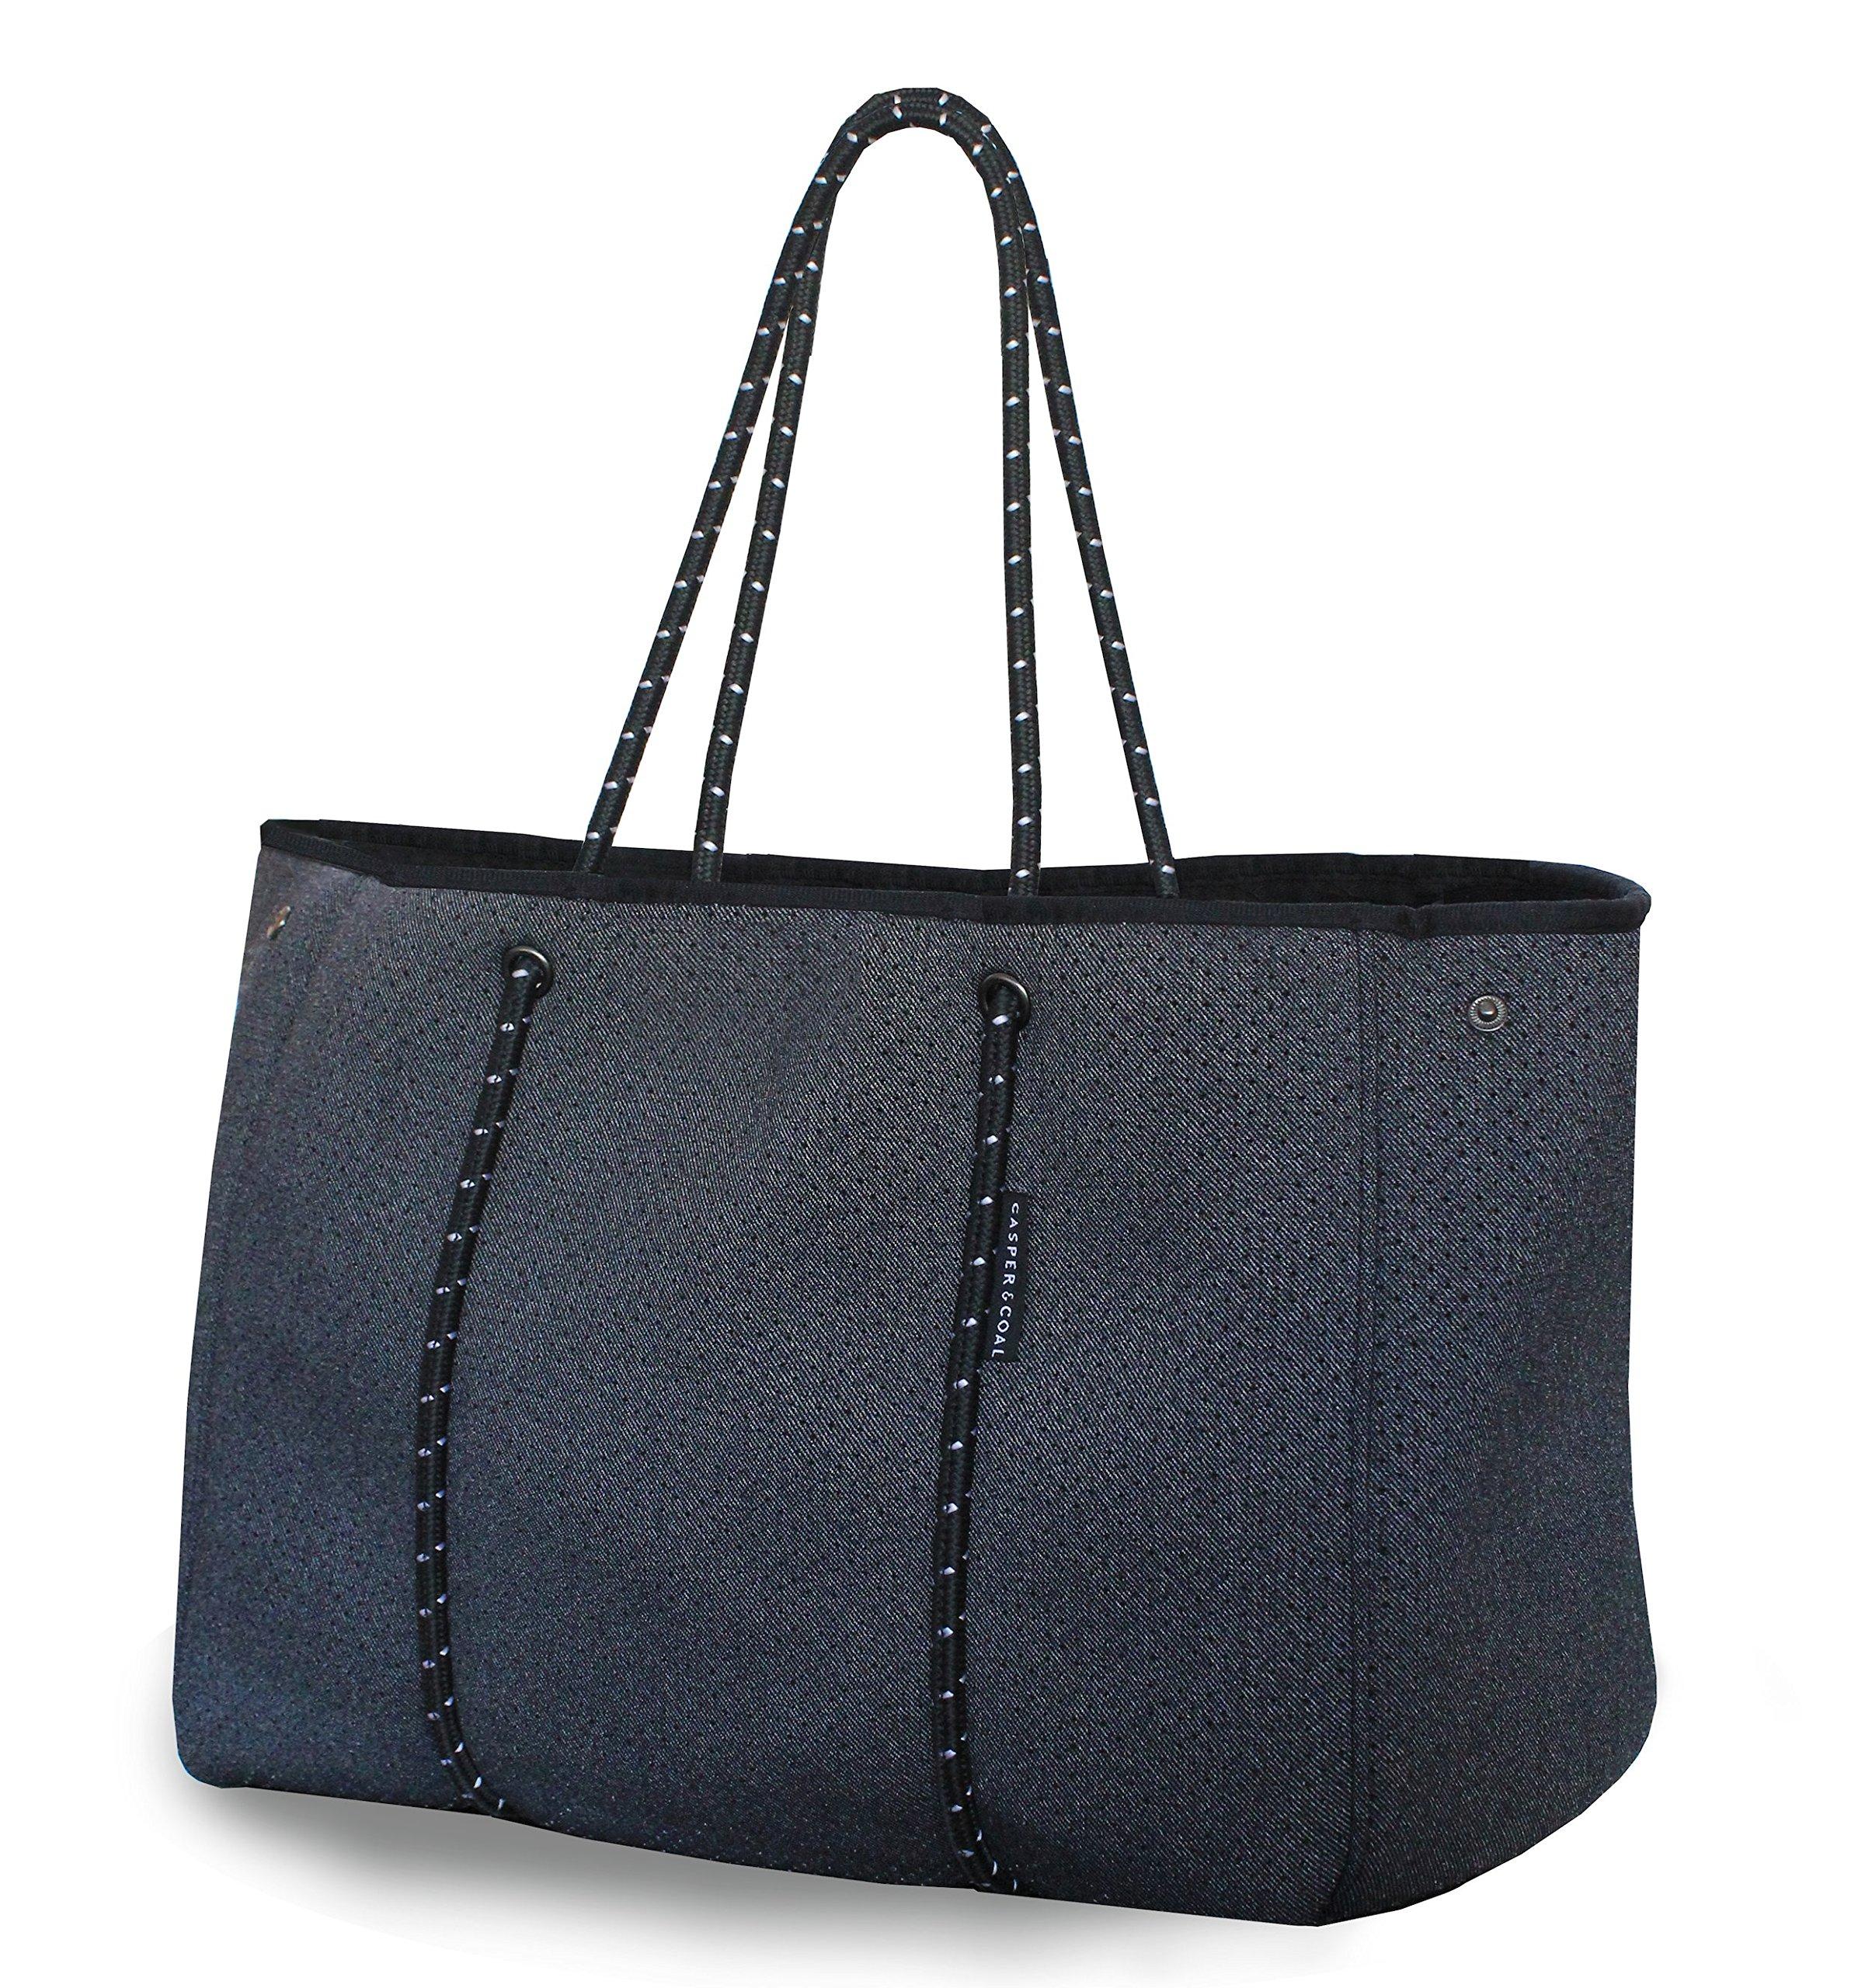 Casper & Coal Multipurpose Tote Beach Bag with Neoprene Exterior/Charcoal